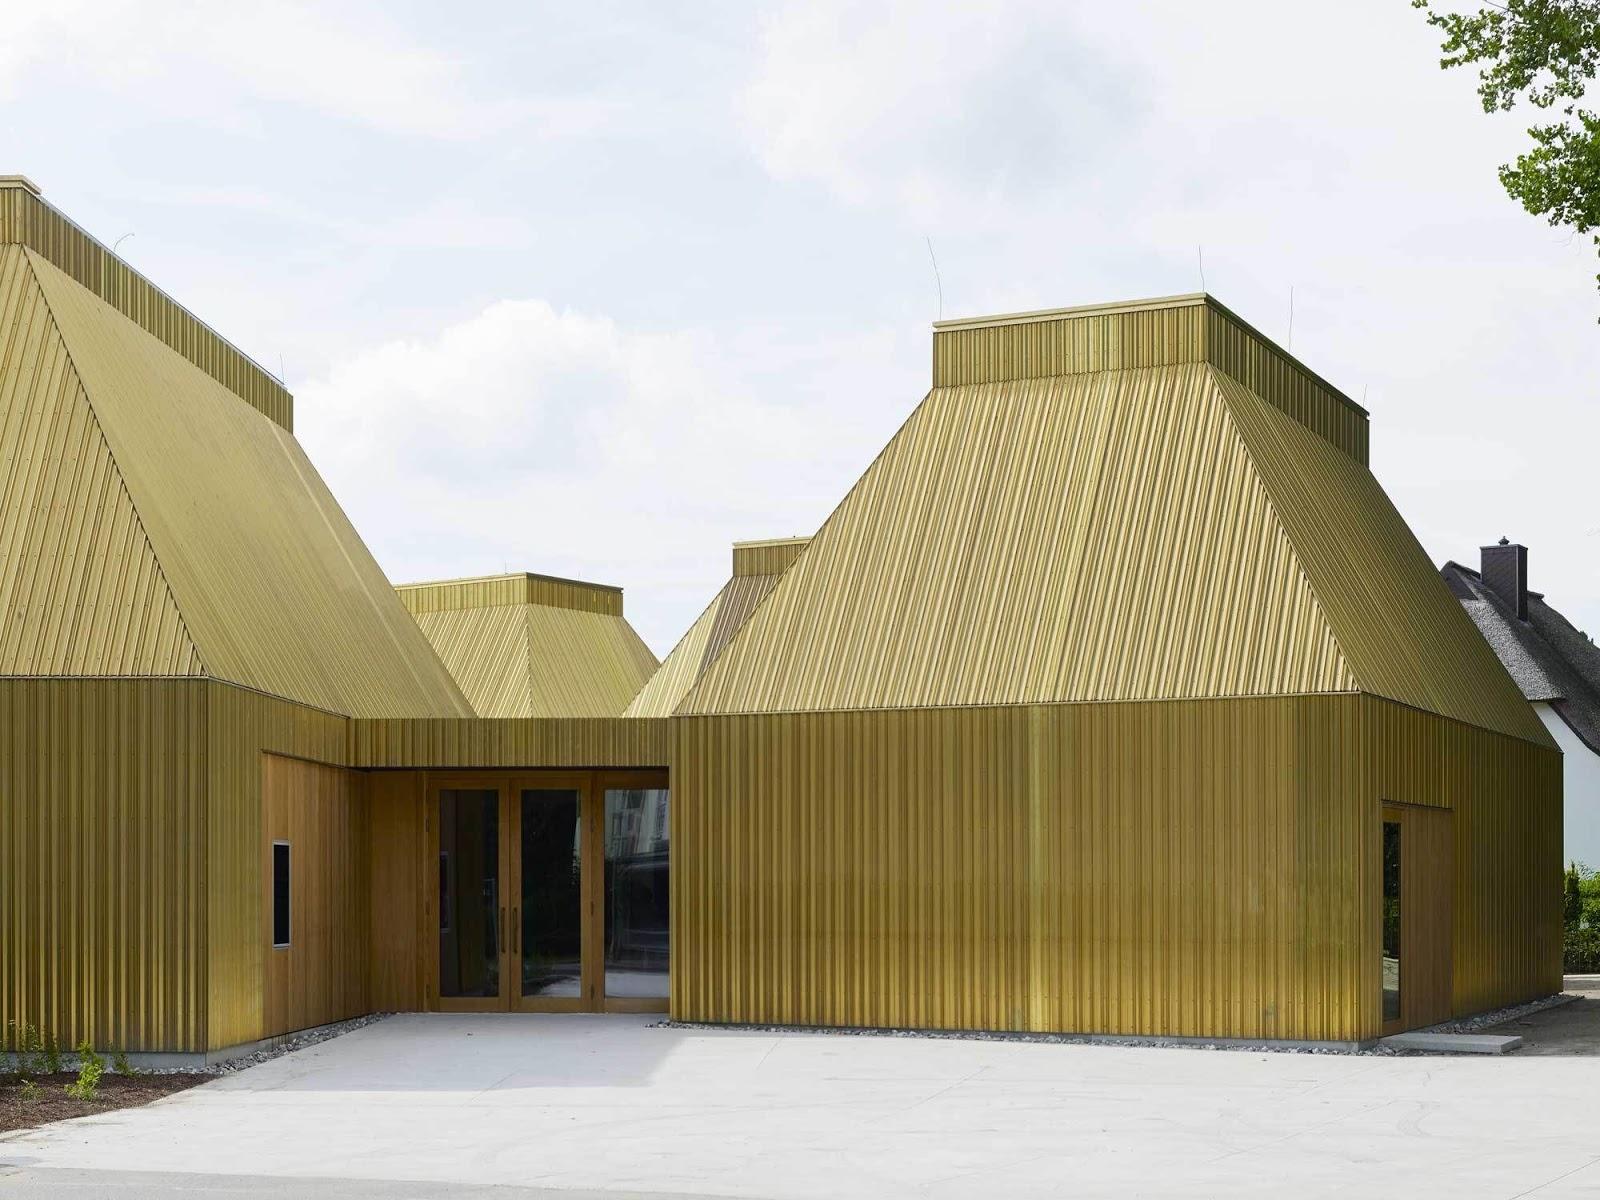 A f a s i a staab architekten - Dachformen architektur ...